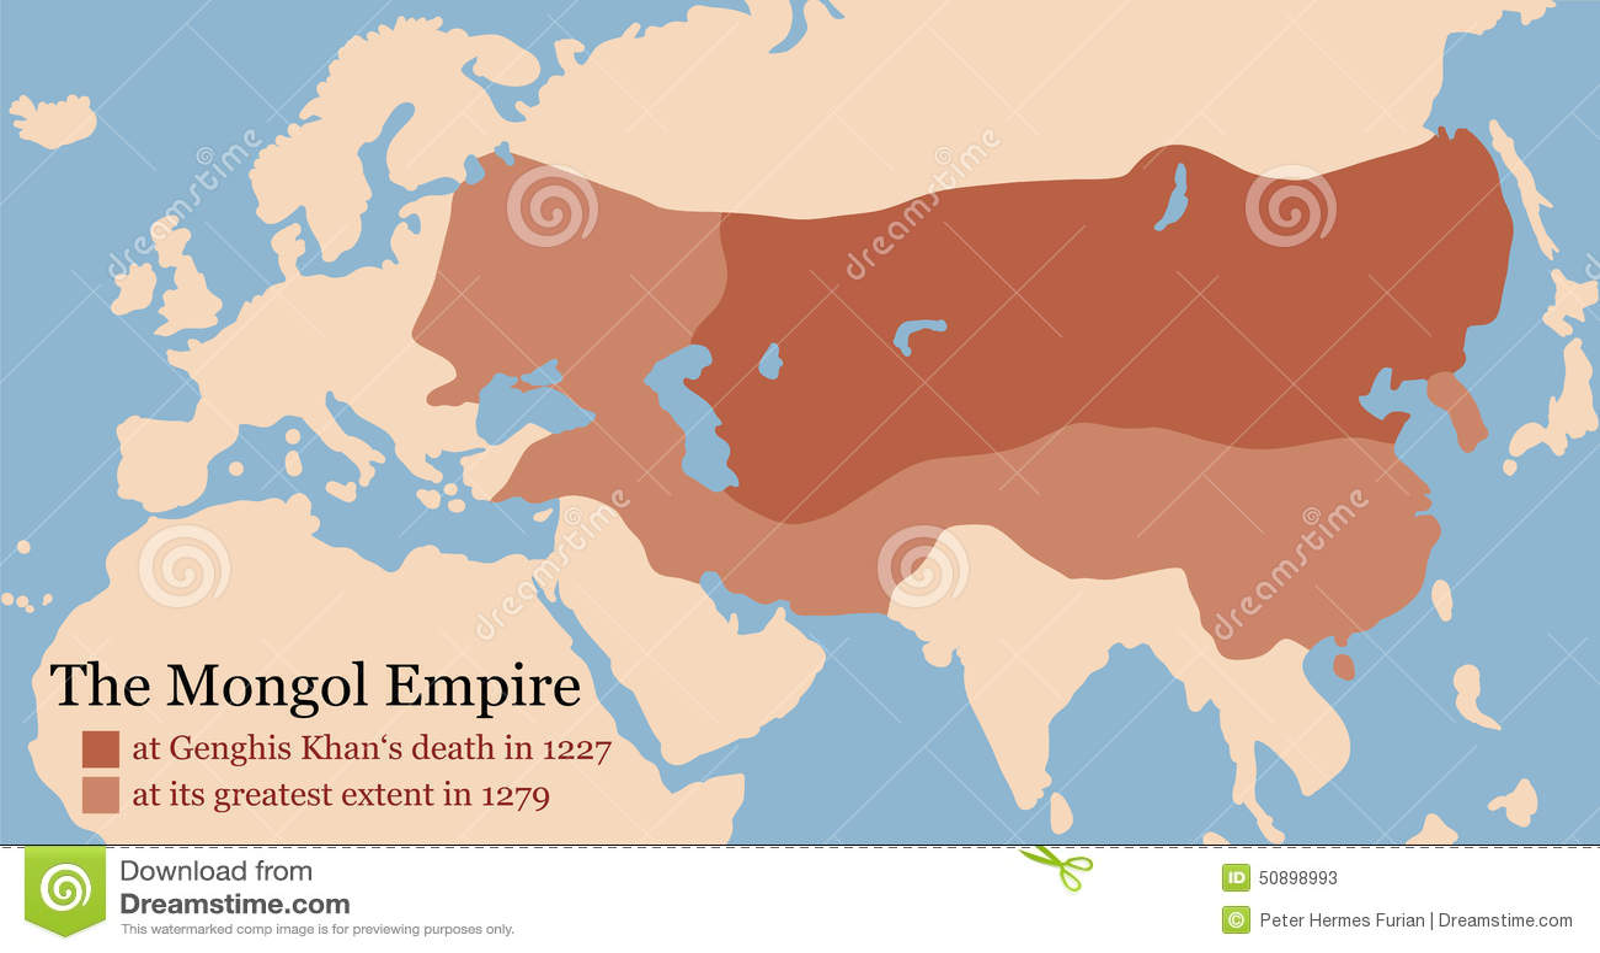 Arab Its Empire Extent Greatest